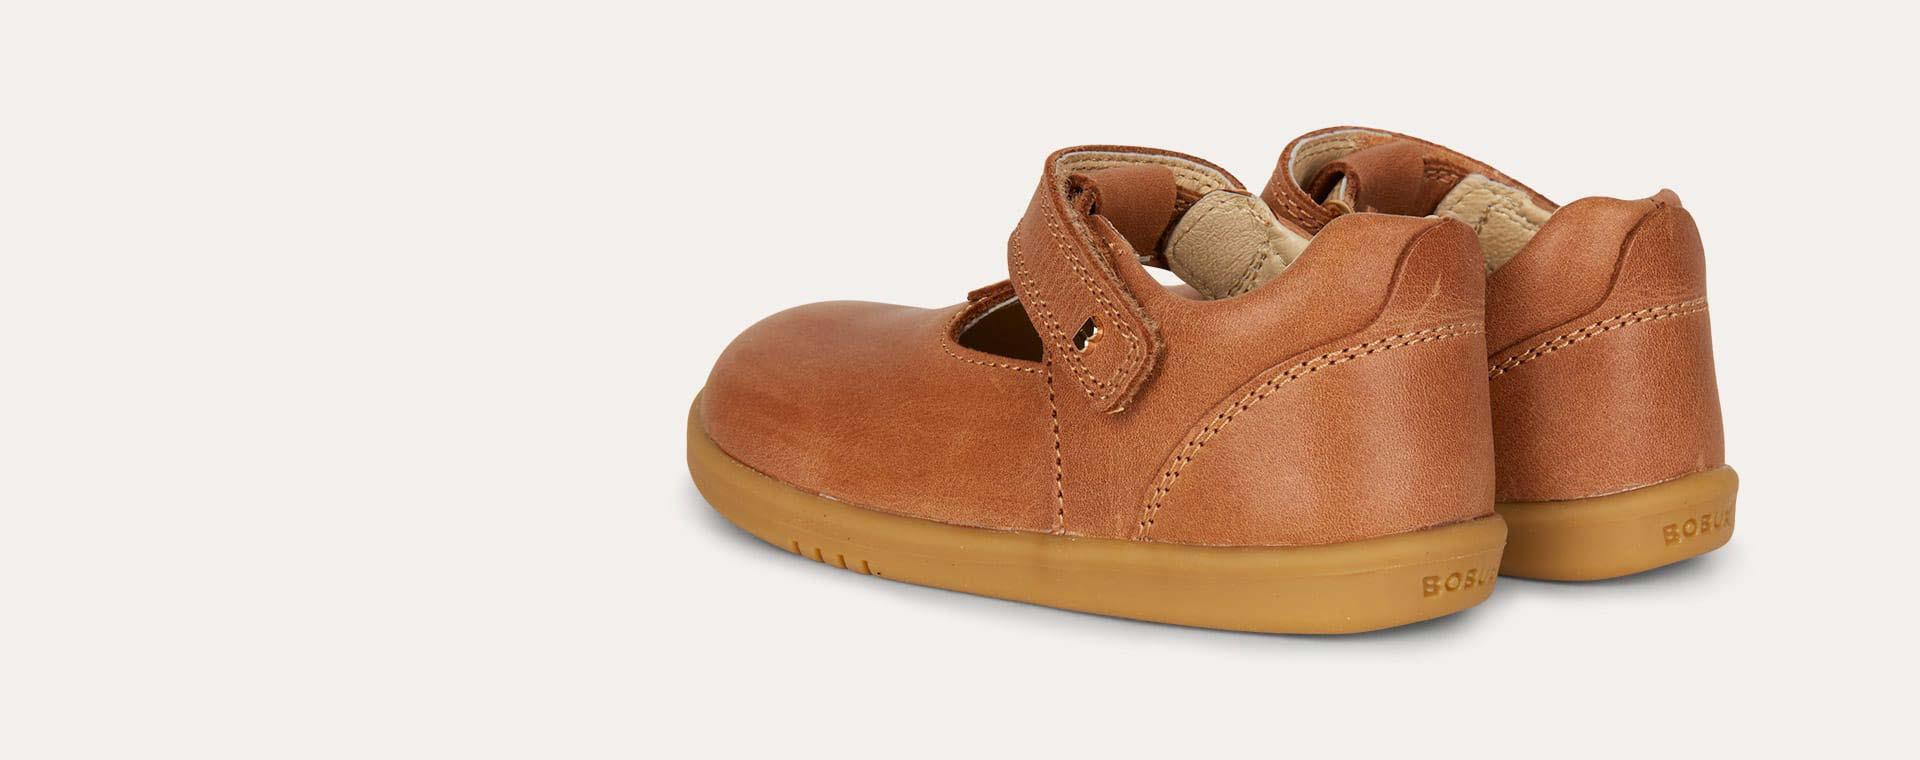 Caramel Bobux I-Walk Louise T-bar Shoe